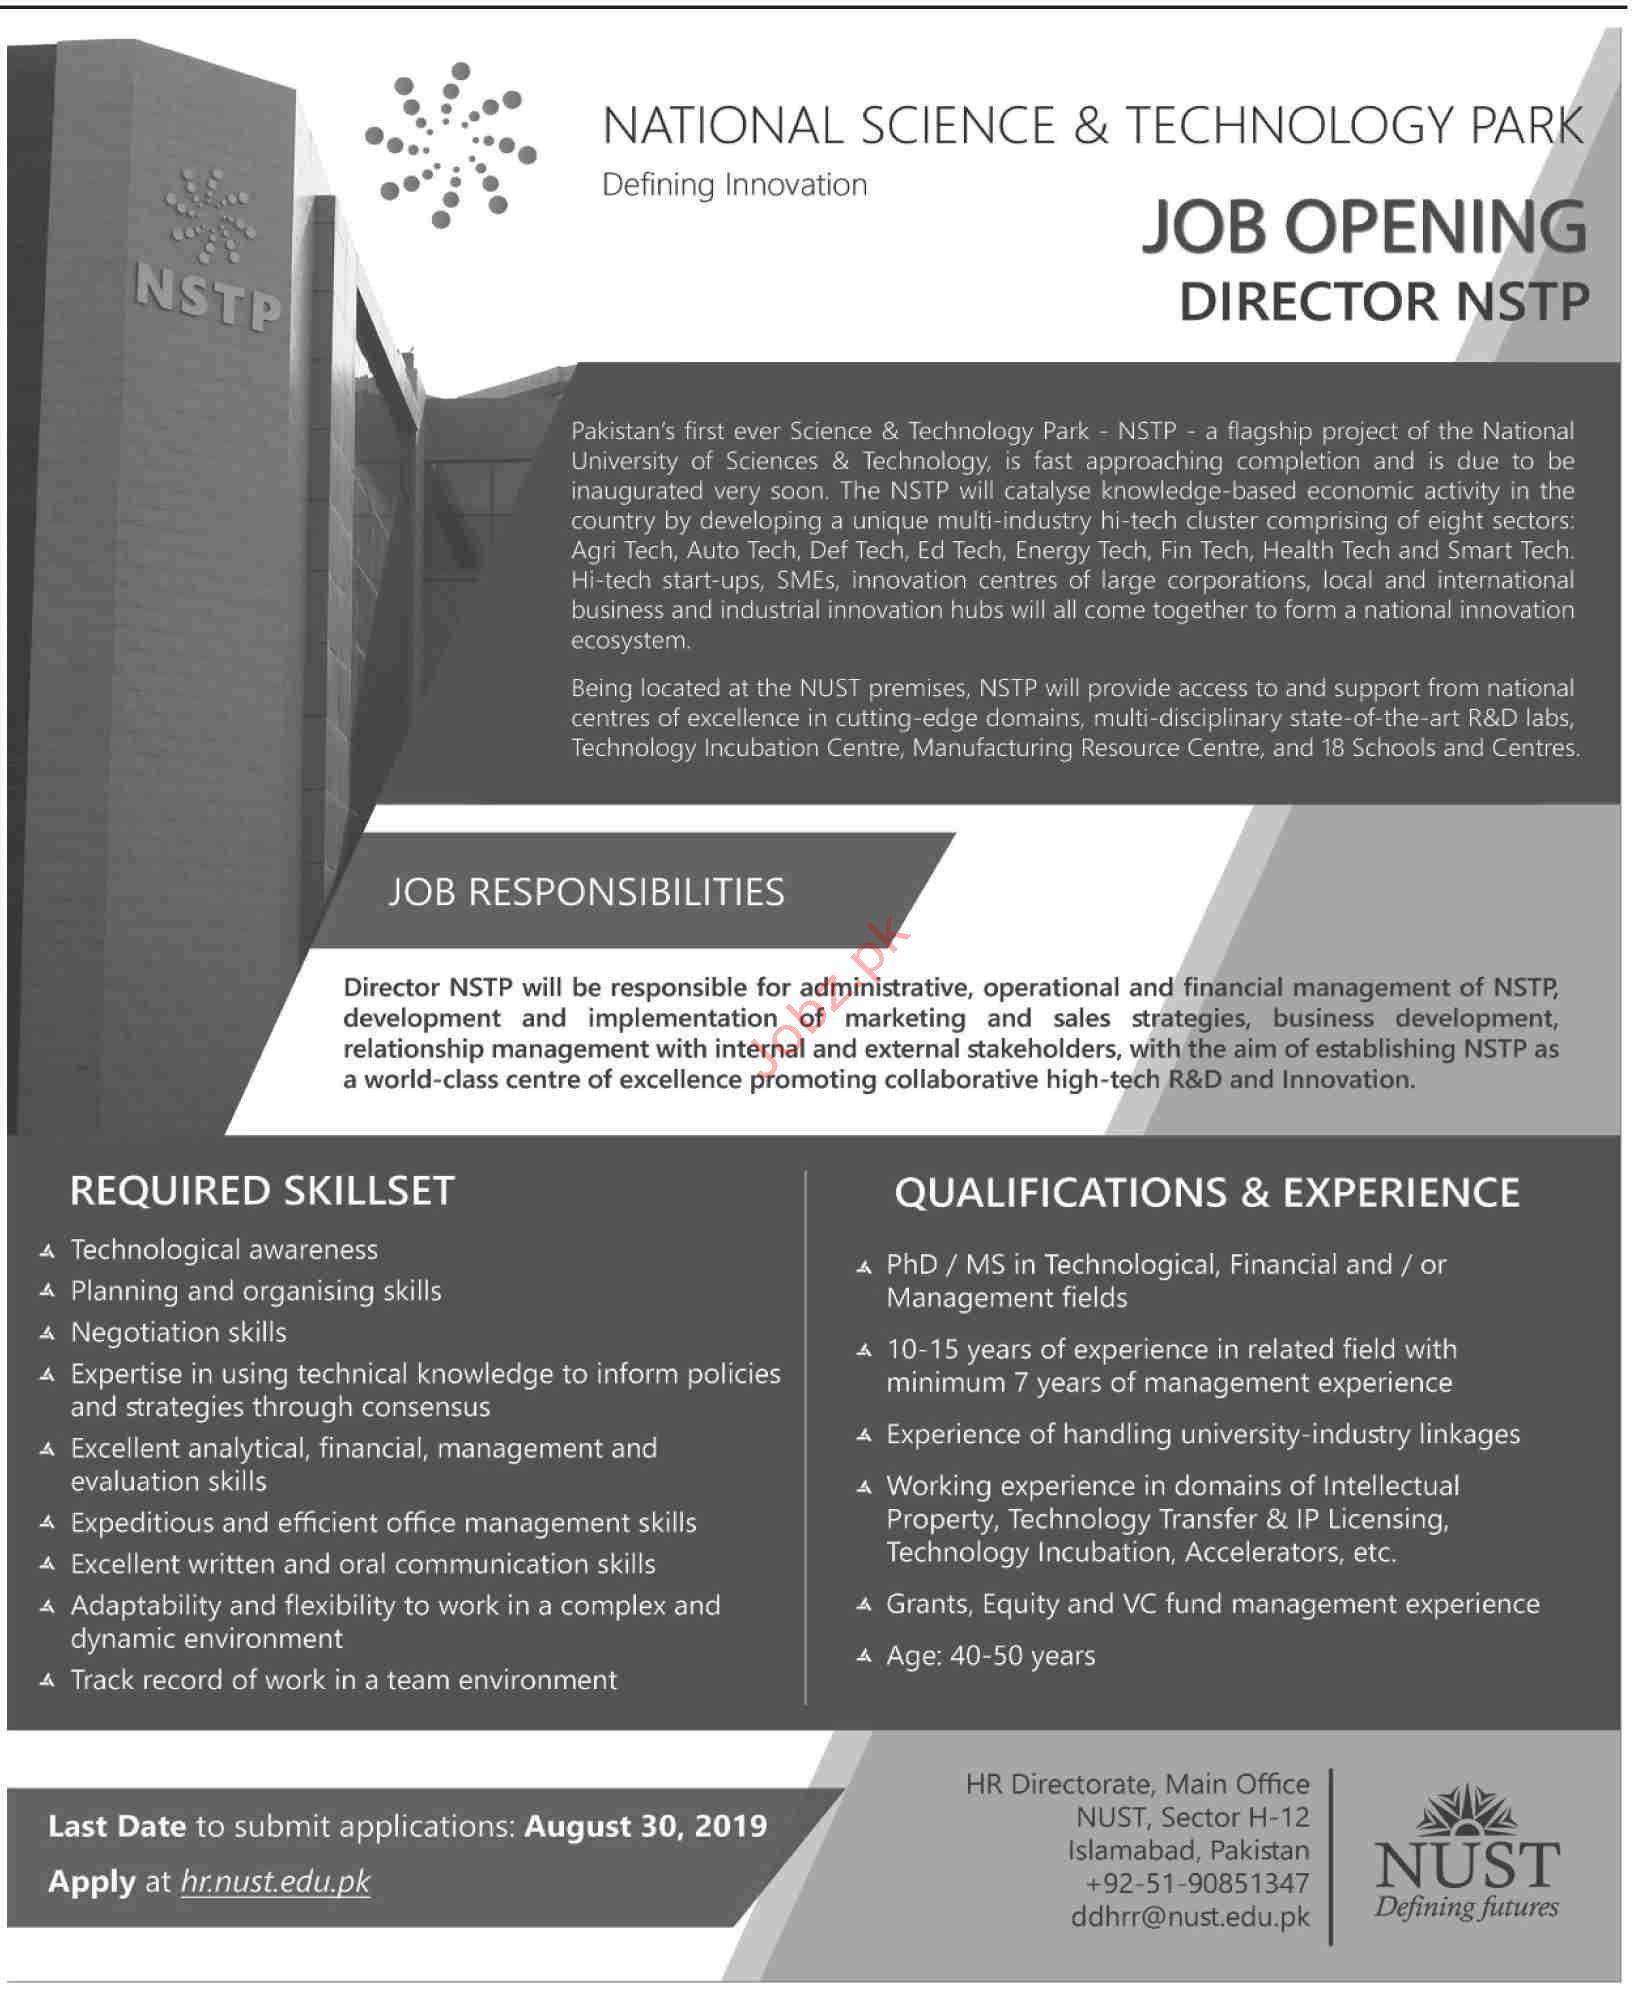 NUST National Science & Technology Park Jobs